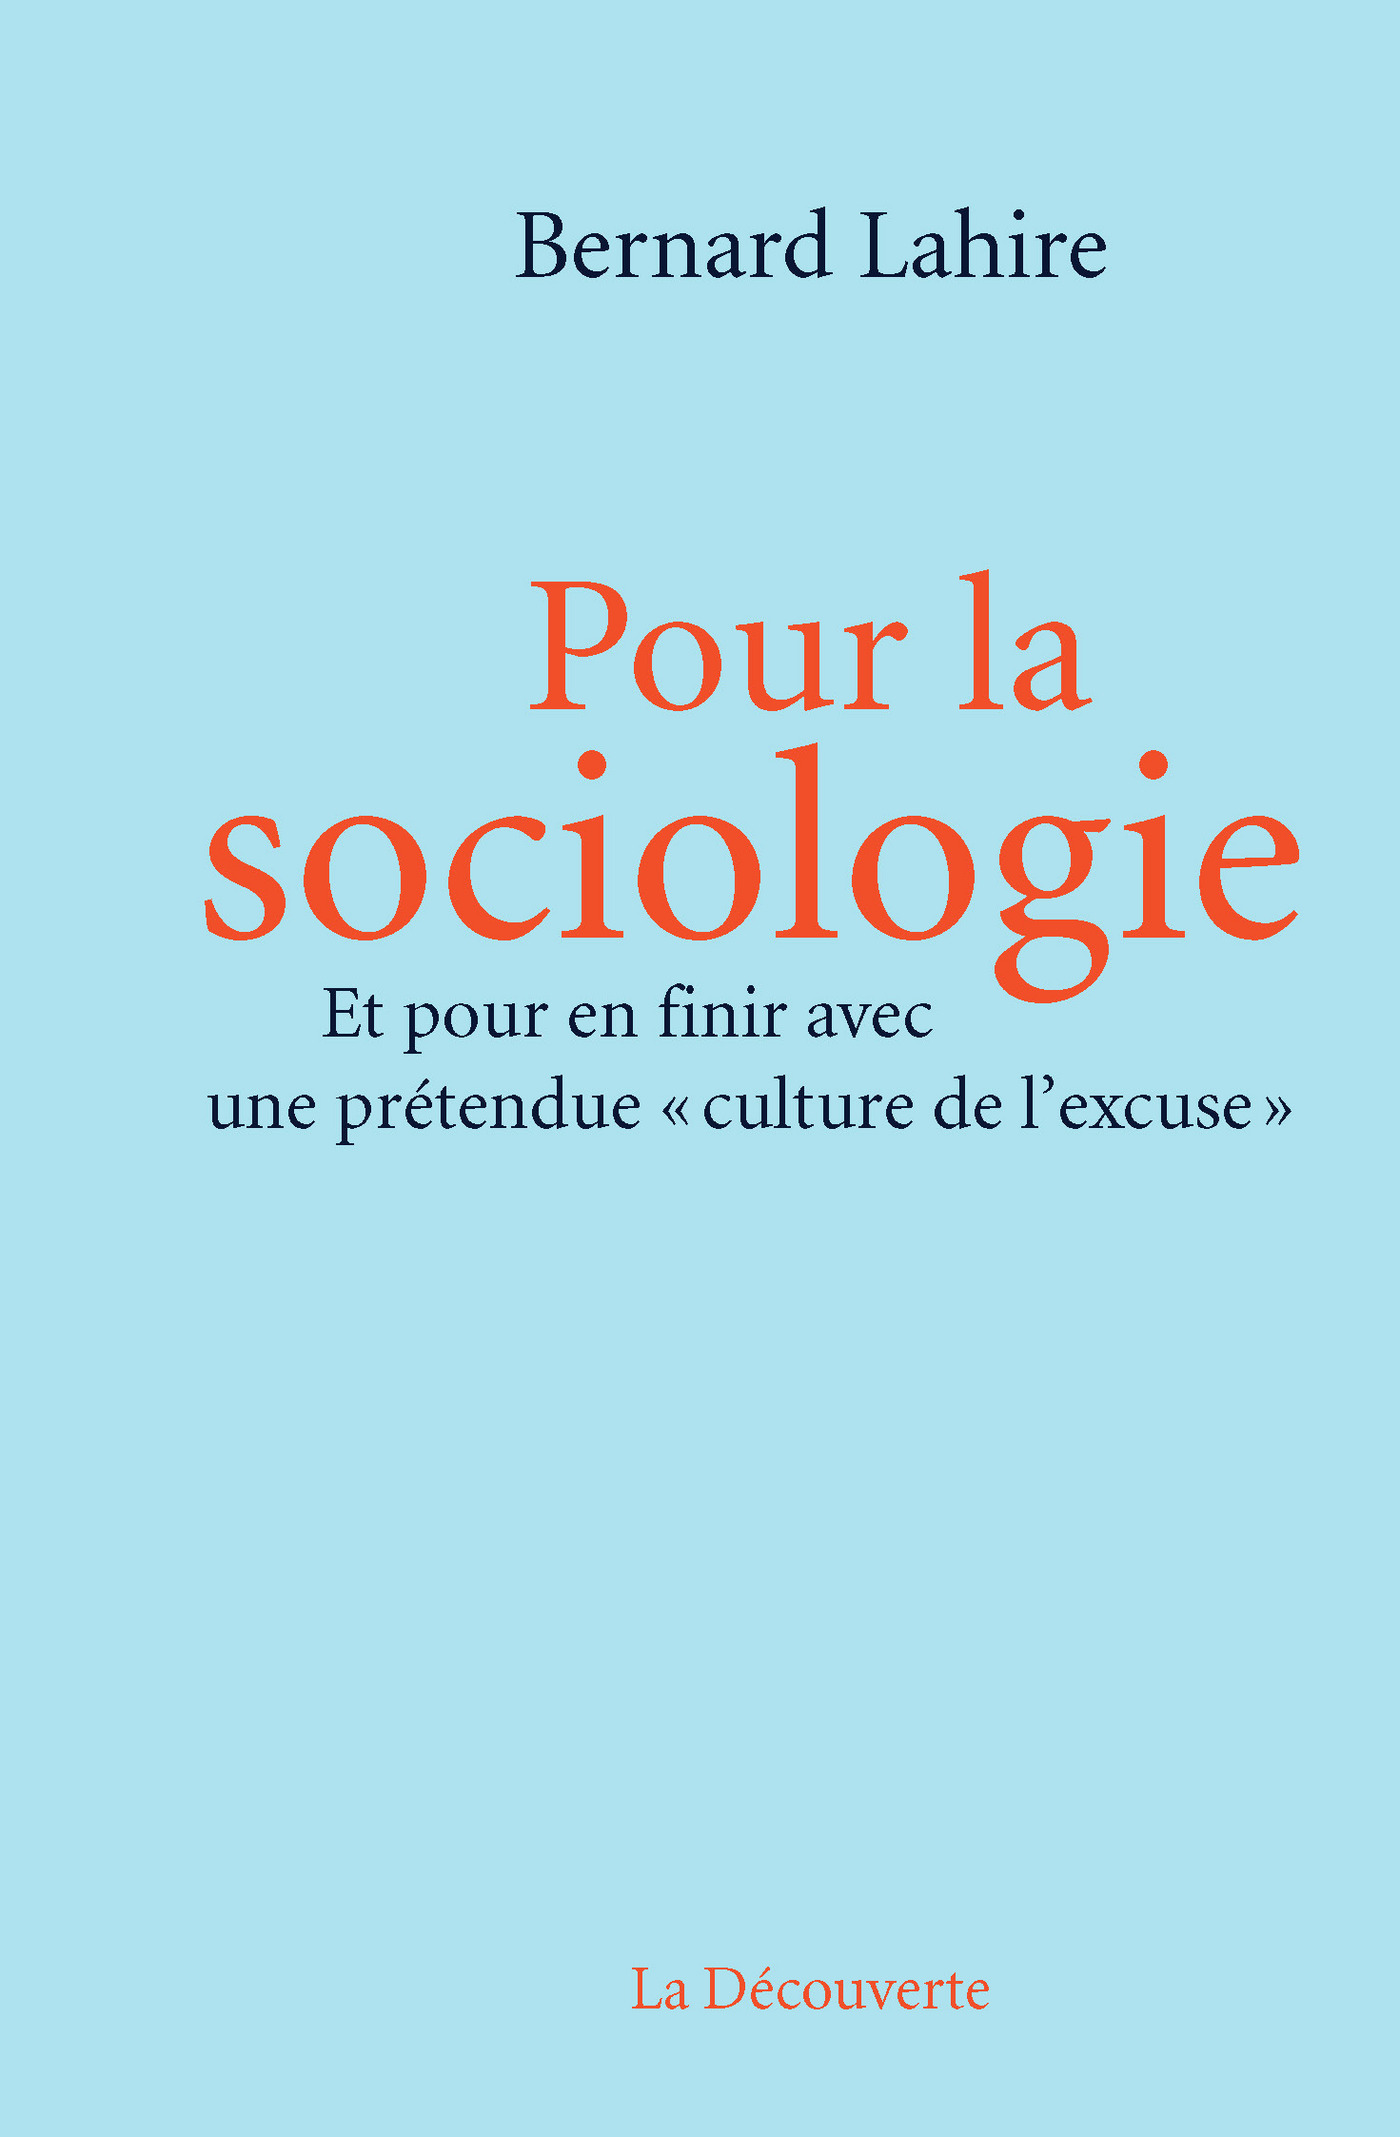 Pour la sociologie (ebook)